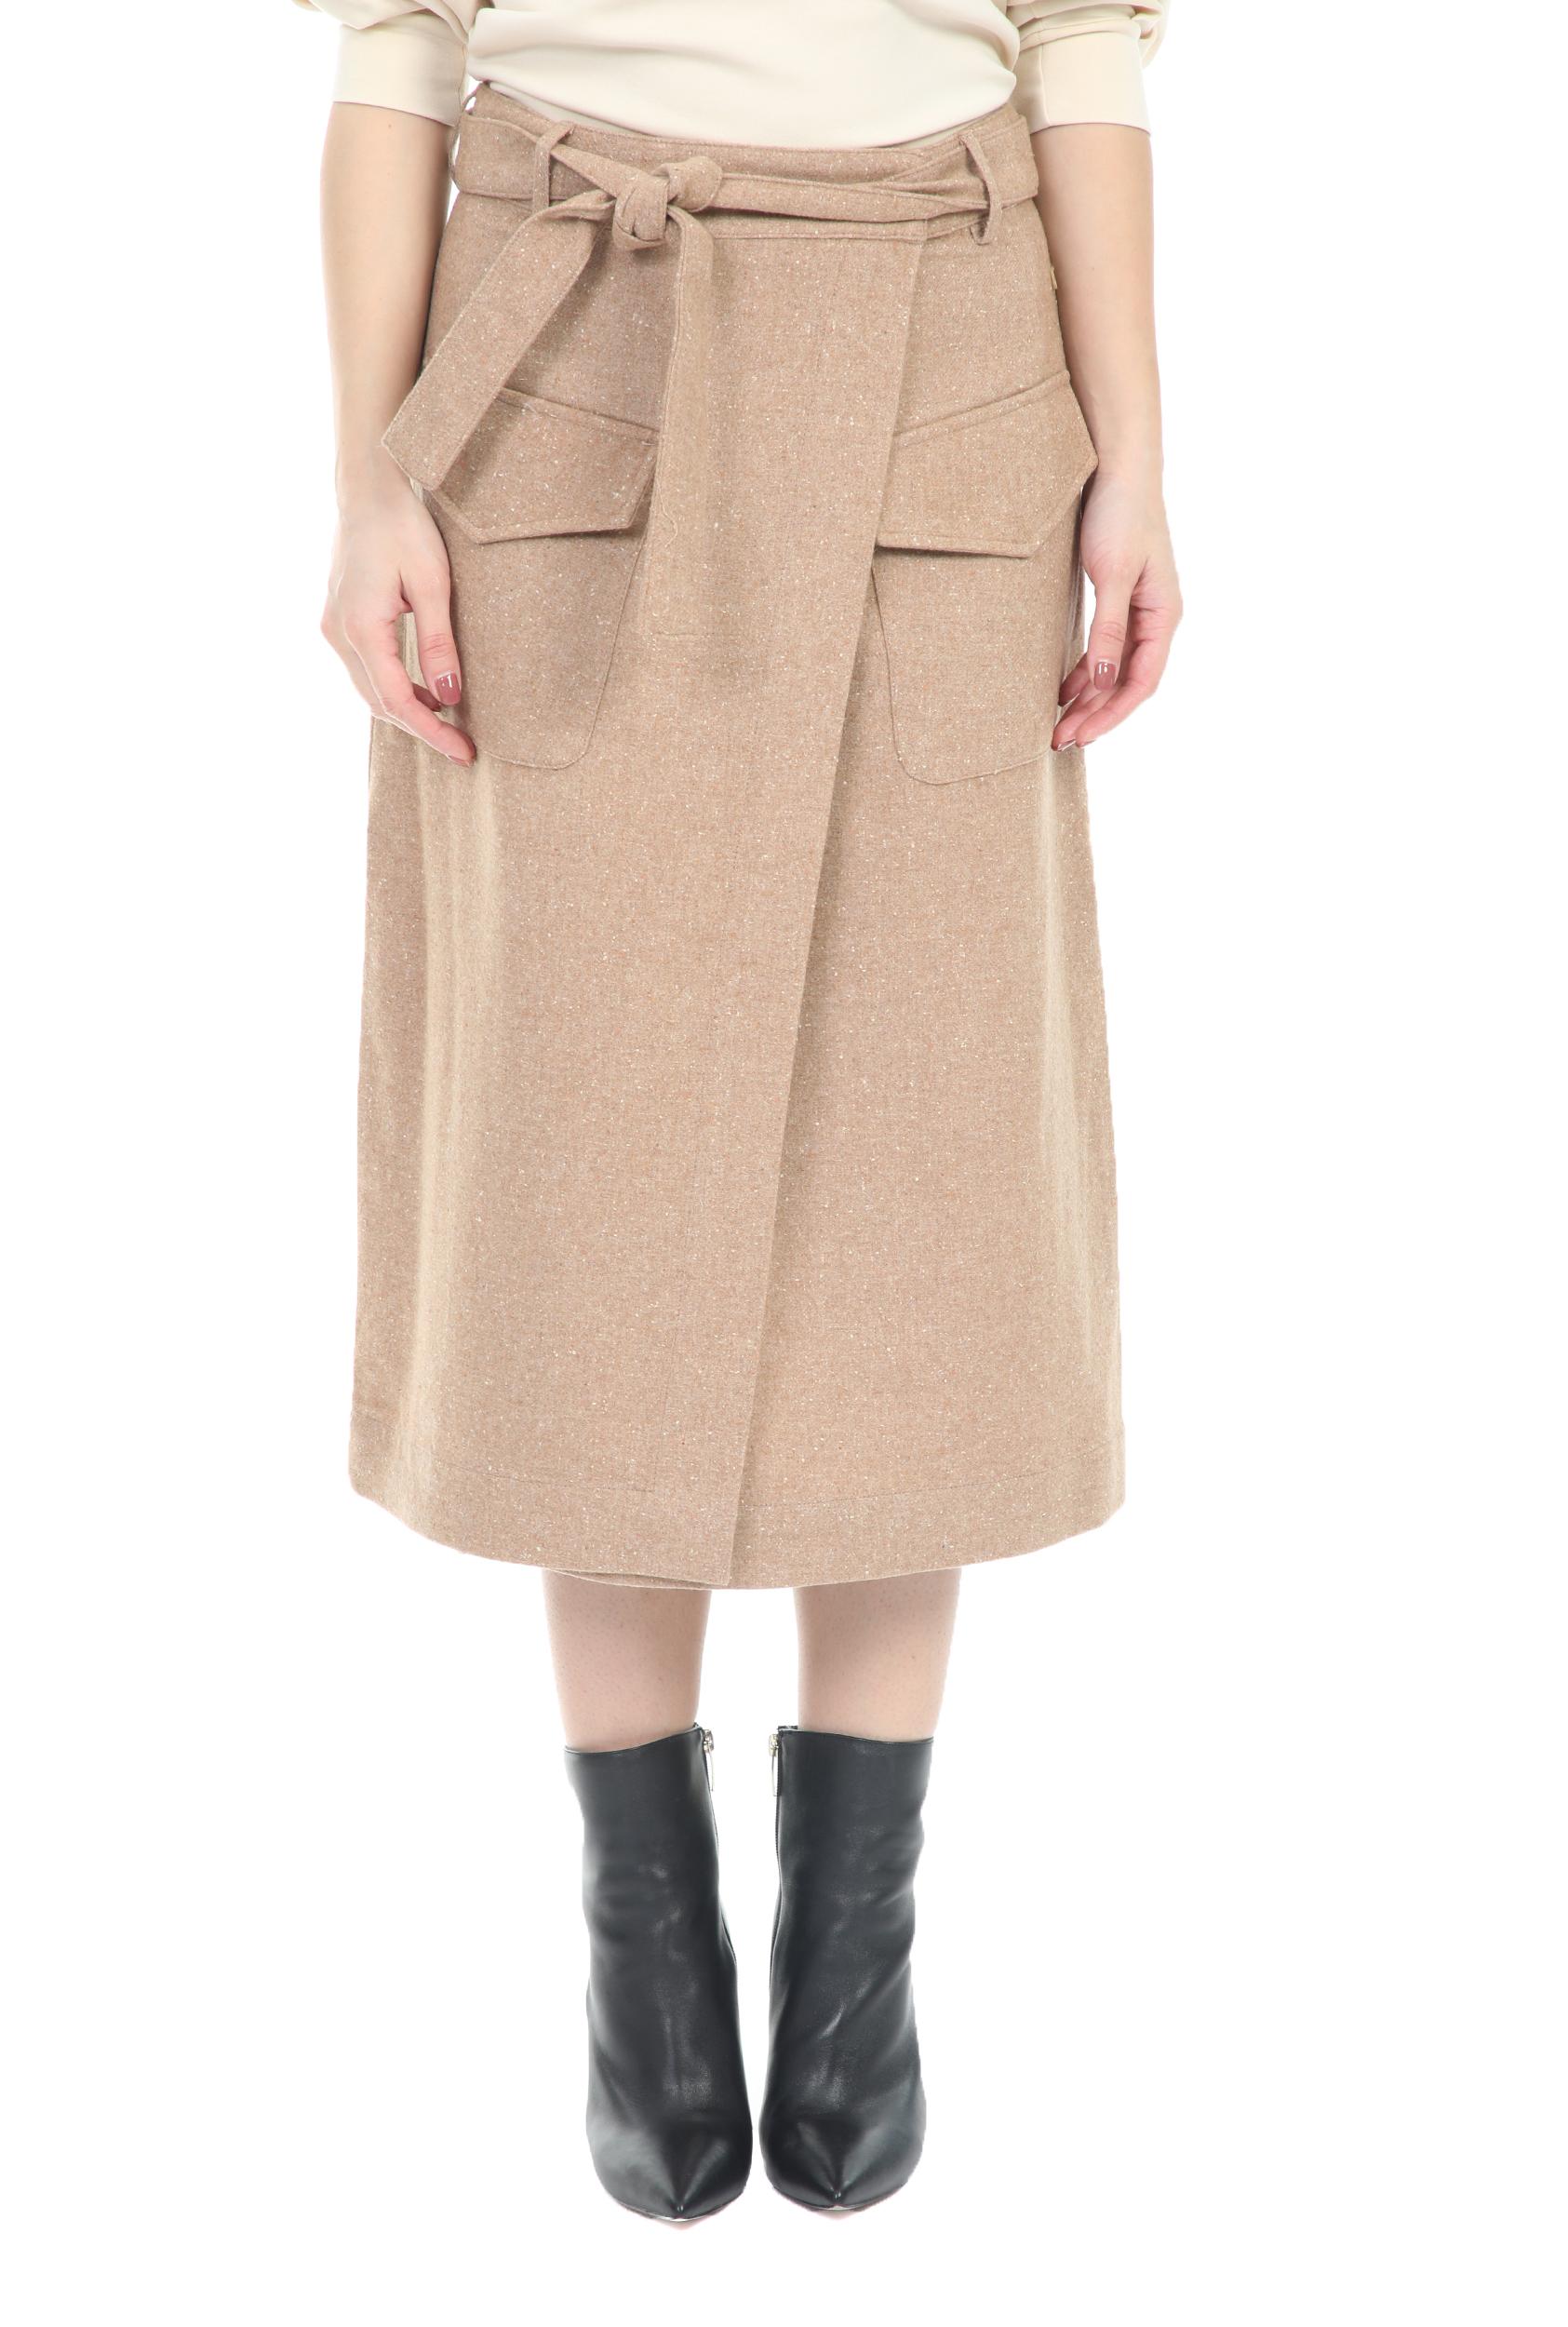 SCOTCH & SODA - Γυναικεία midi φούστα Wrap-over SCOTCH & SODA μπεζ